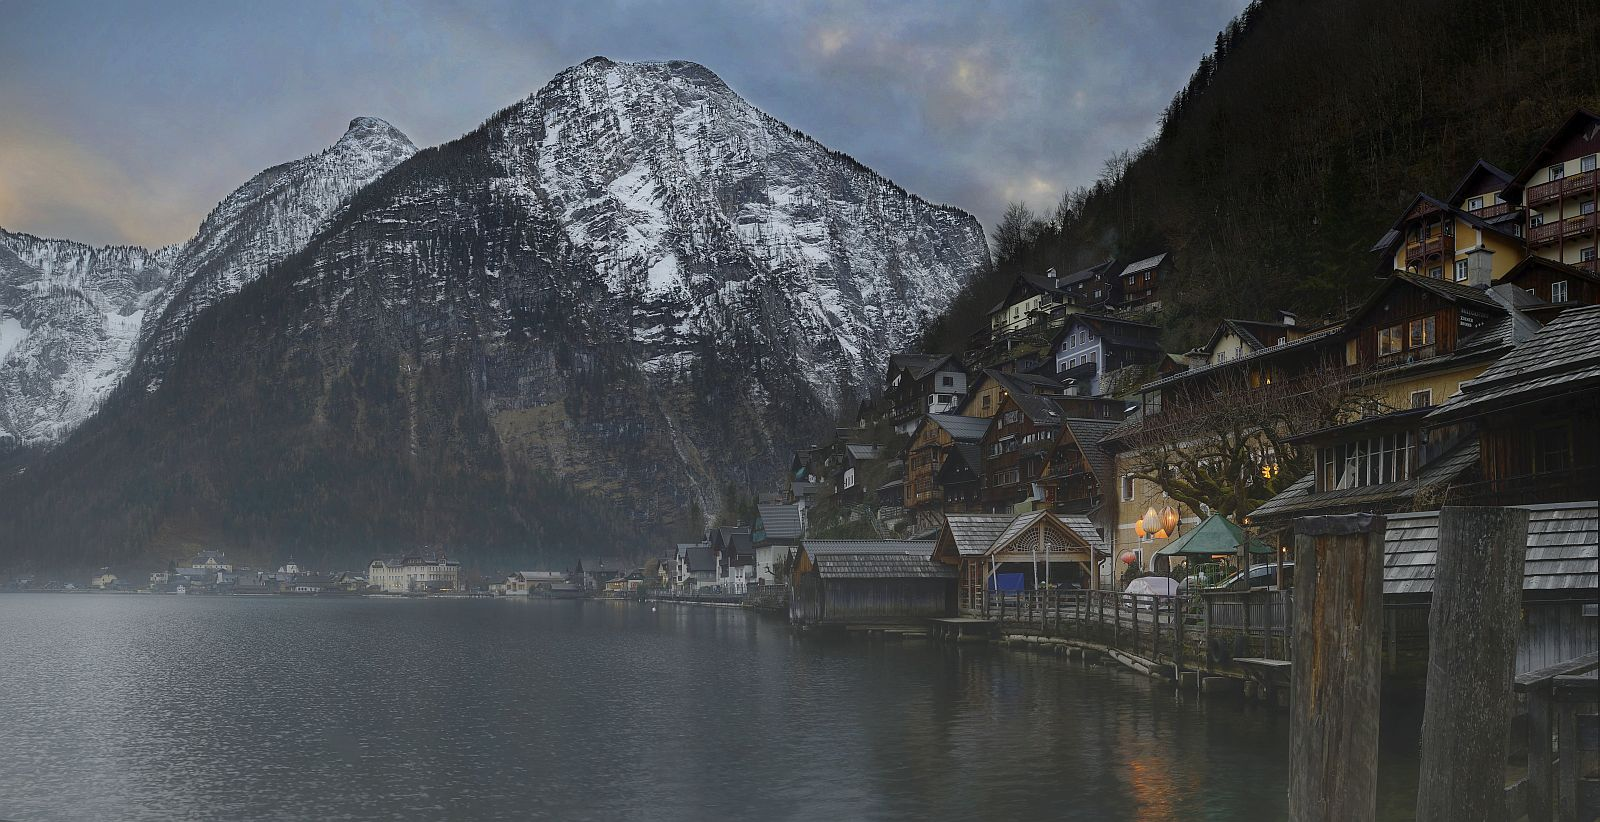 Austria, Land, Landscape, Mountains, Nature, Panorama, Австрия, Горы, Панорама, Пейзаж, Природа, Ефимов Александр